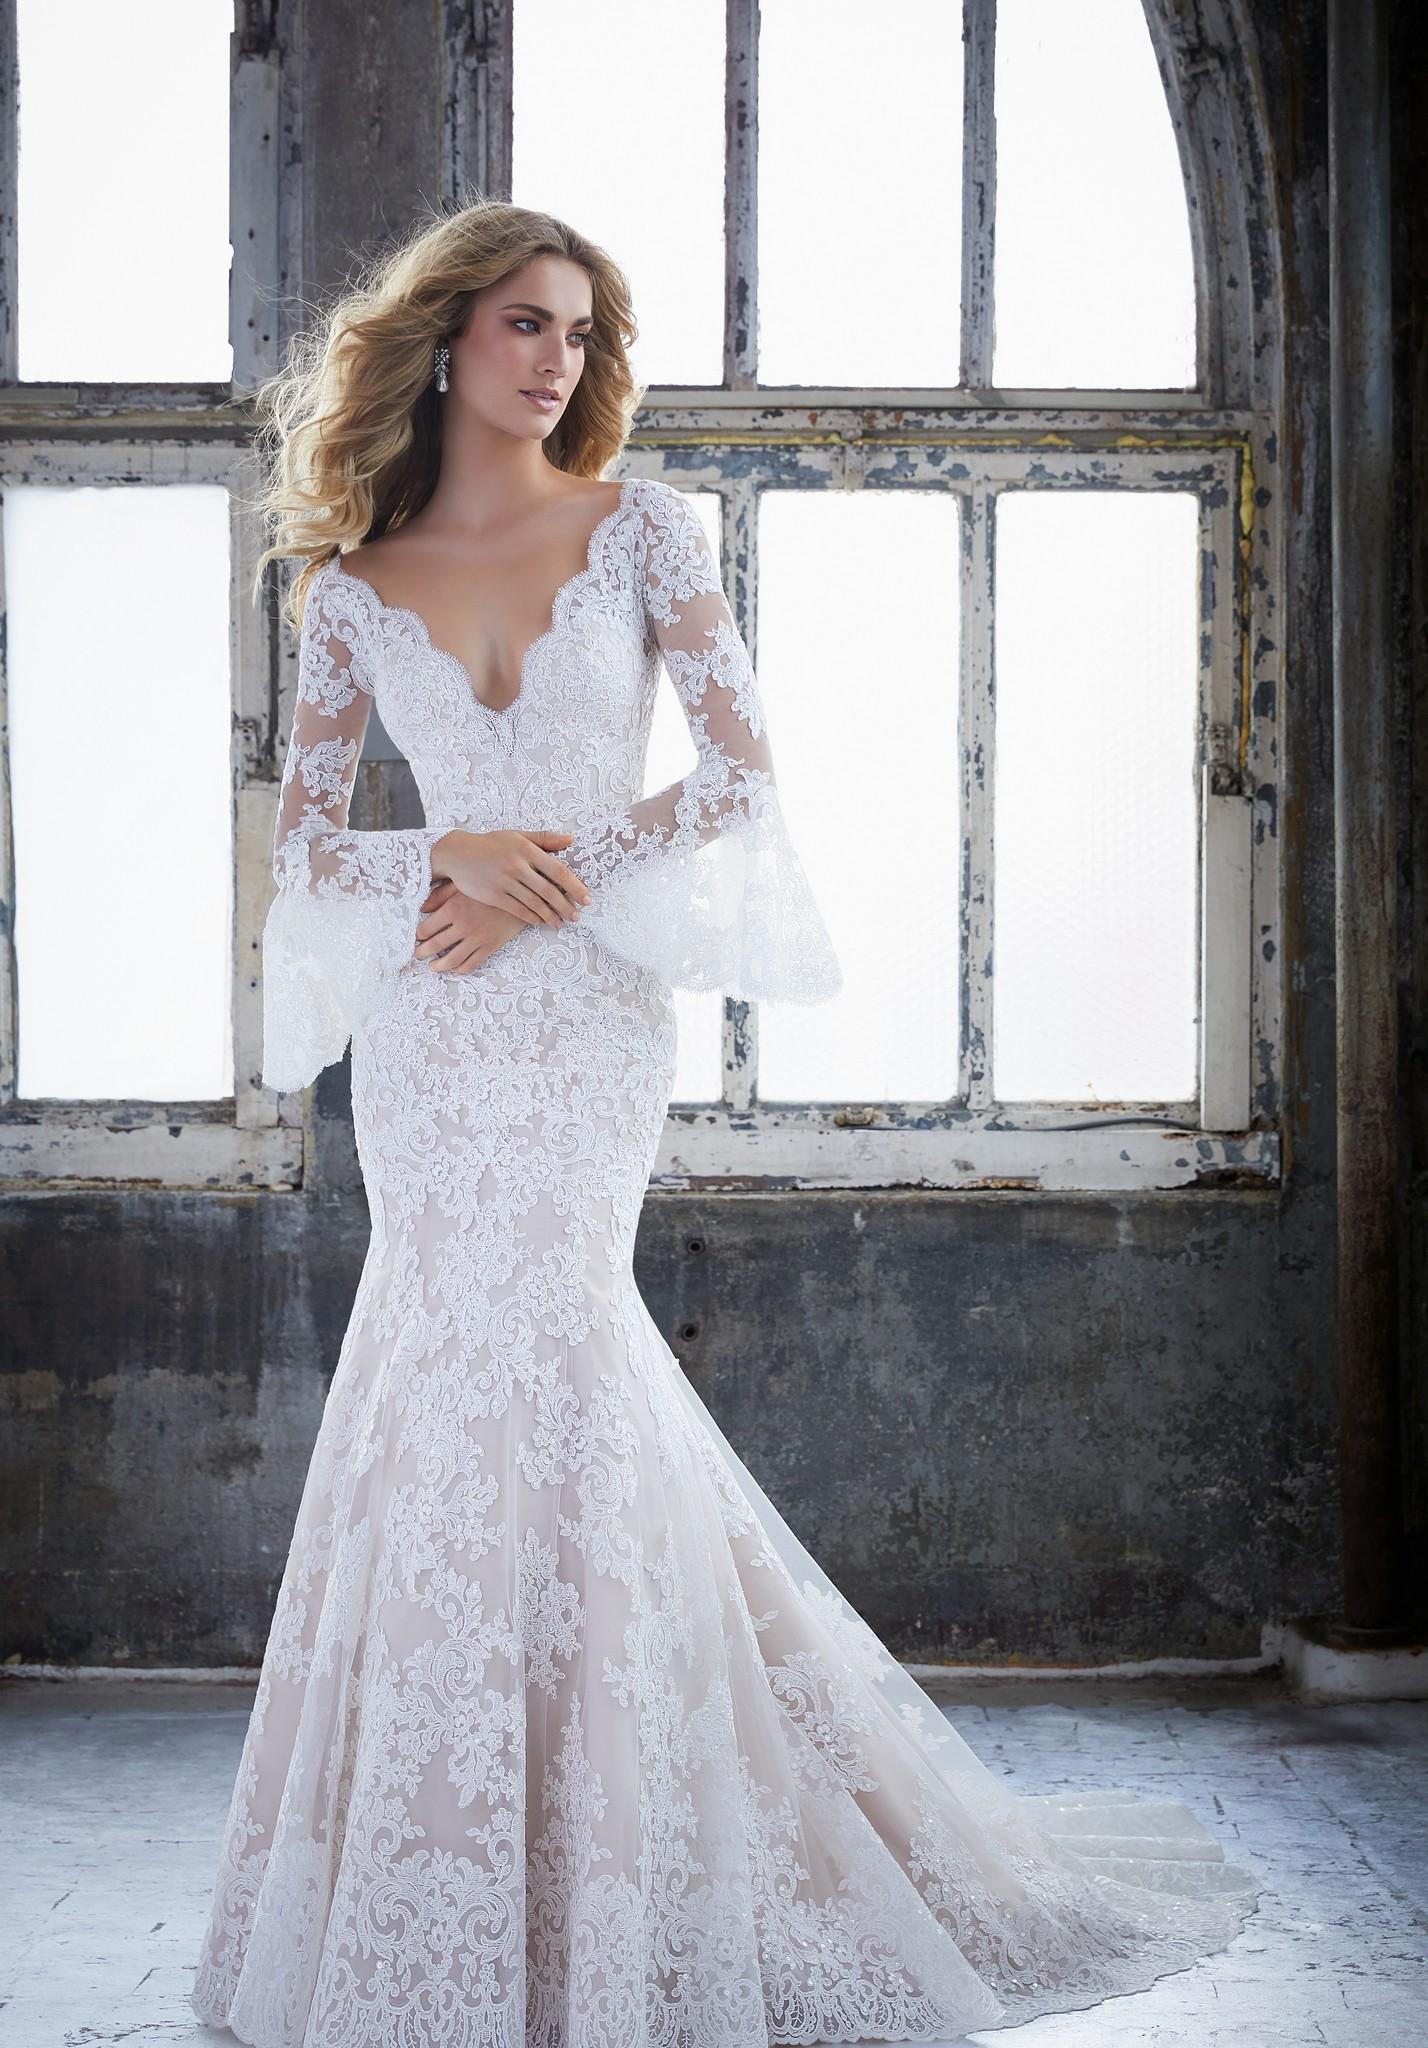 long white wedding dresses photo - 1